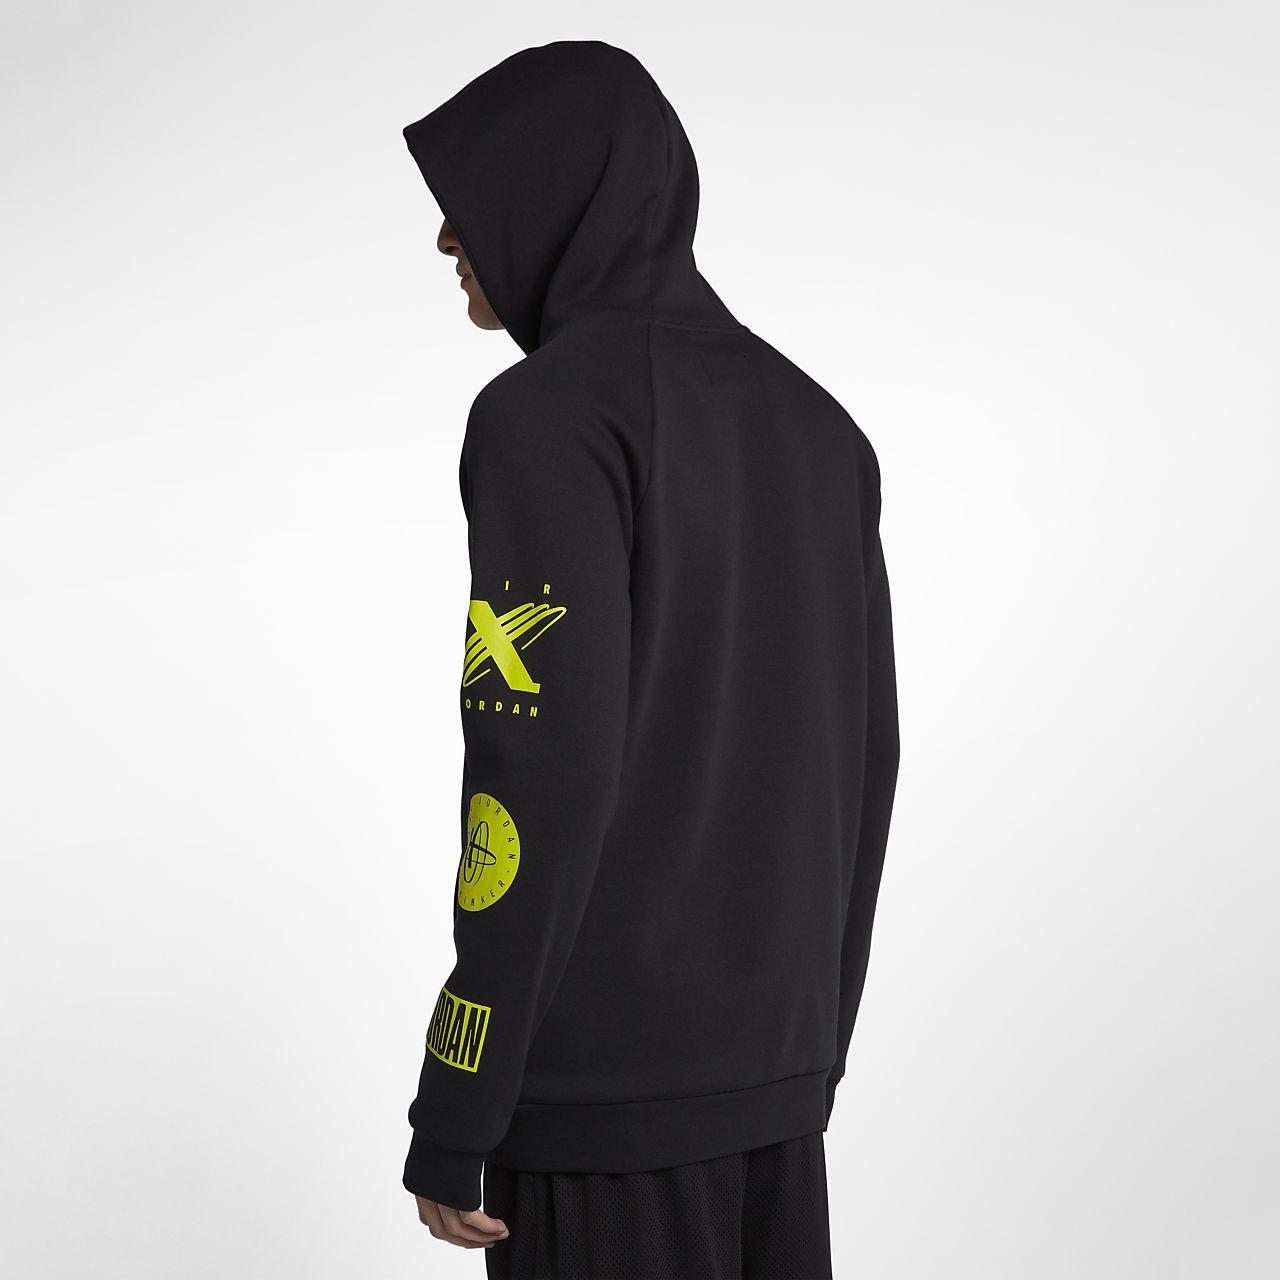 553377317e7a0f Jordan Legacy Tinker Story Men s Fleece Pullover Hoodie. Nike.com